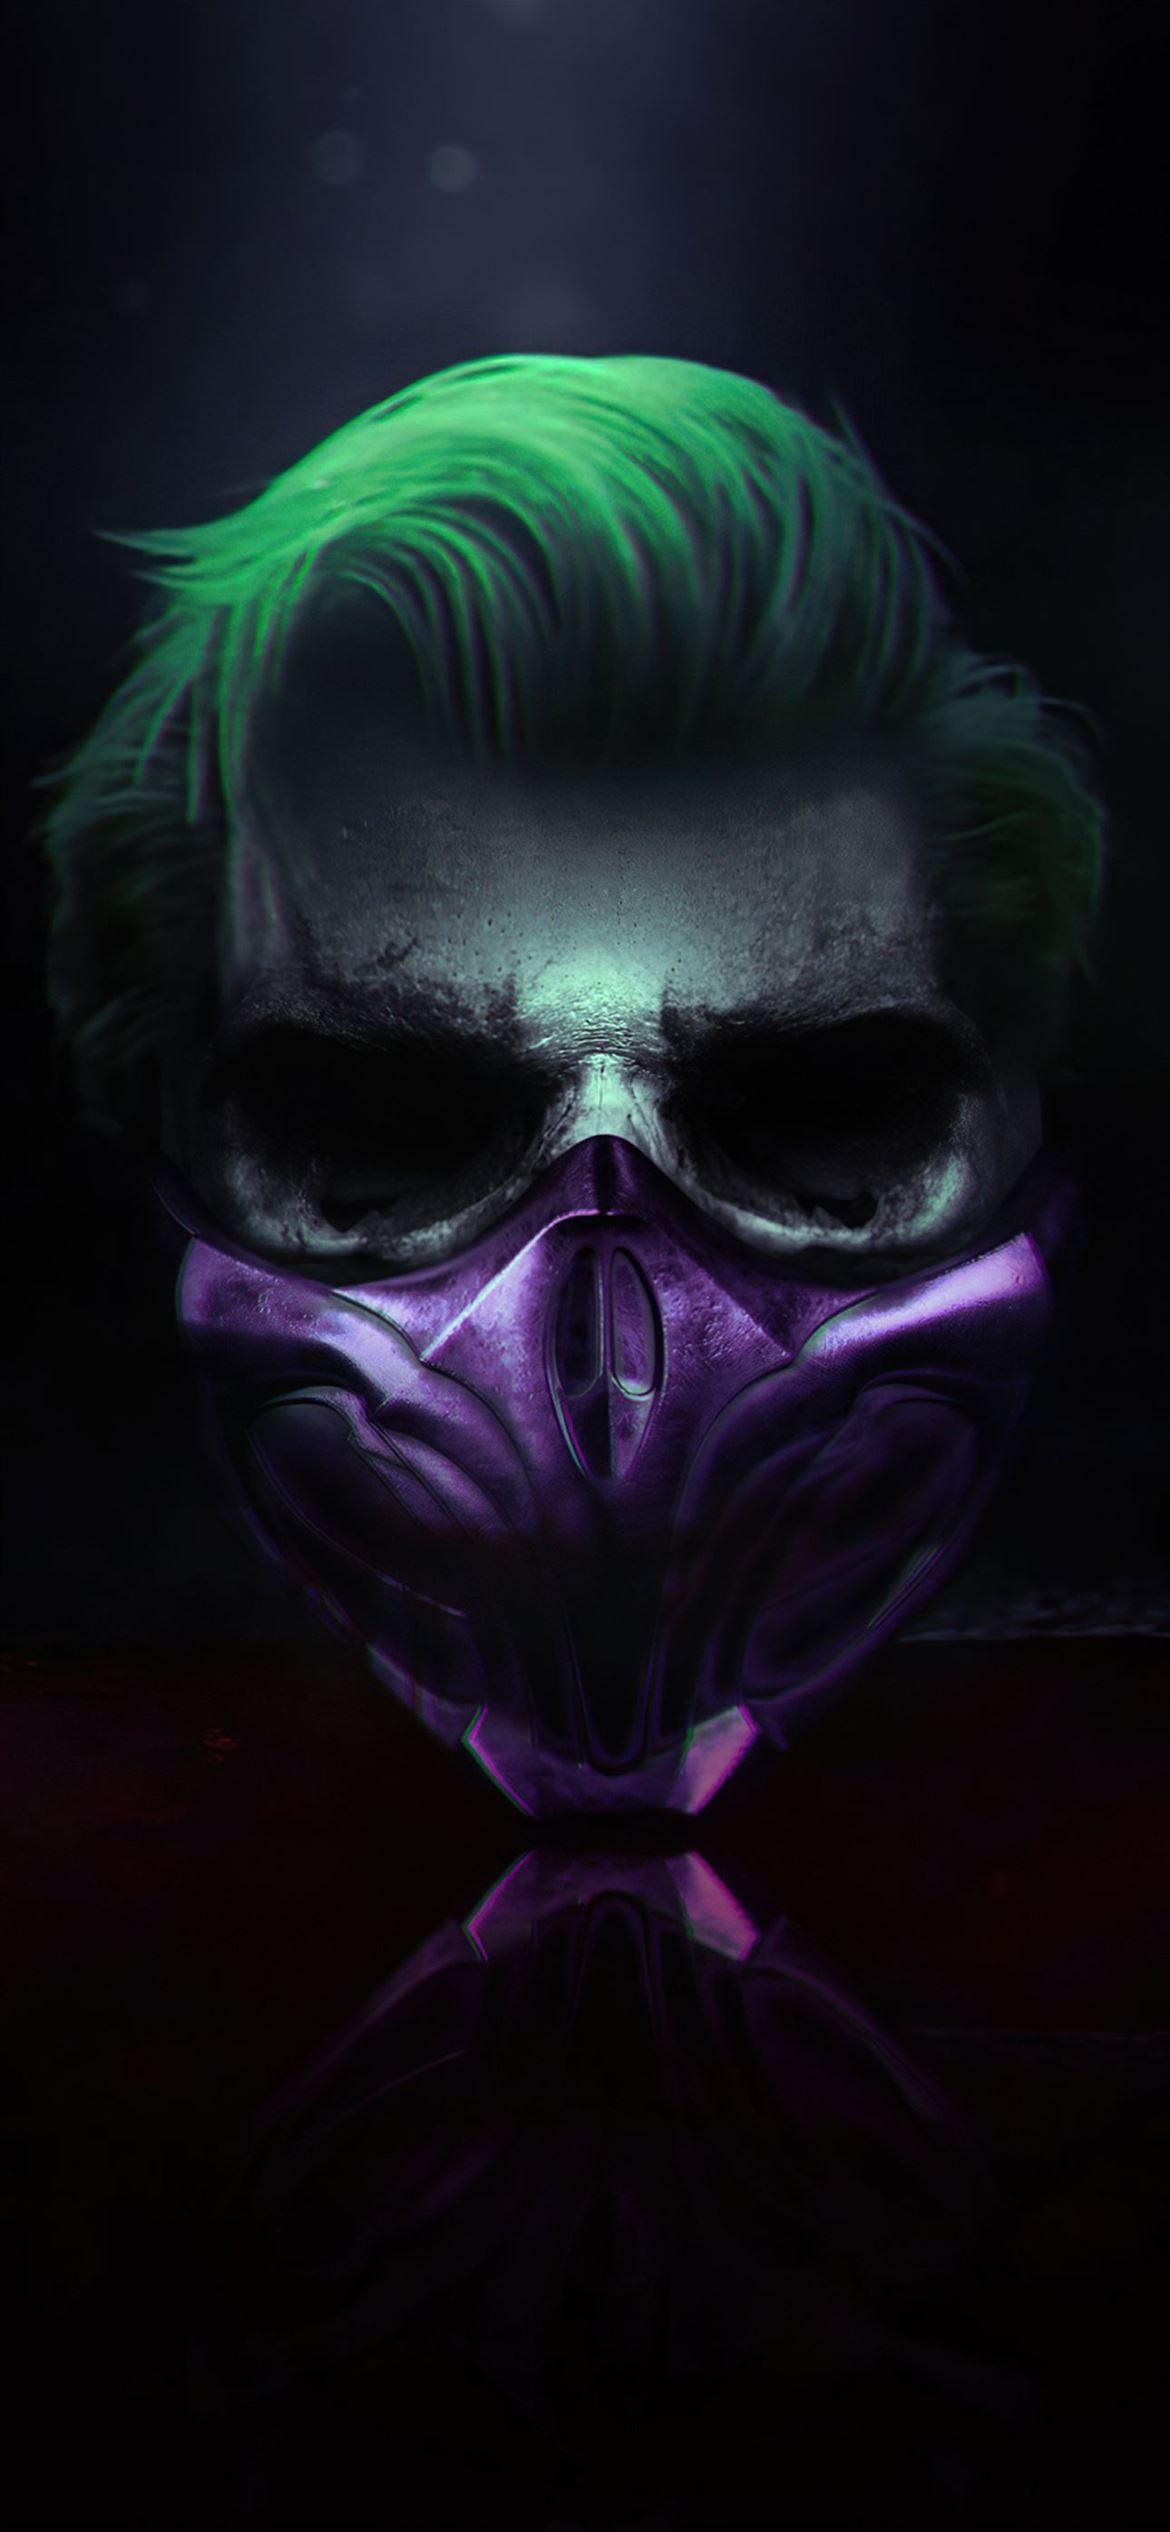 4k Joker Mask Iphone 12 Wallpapers Free Download